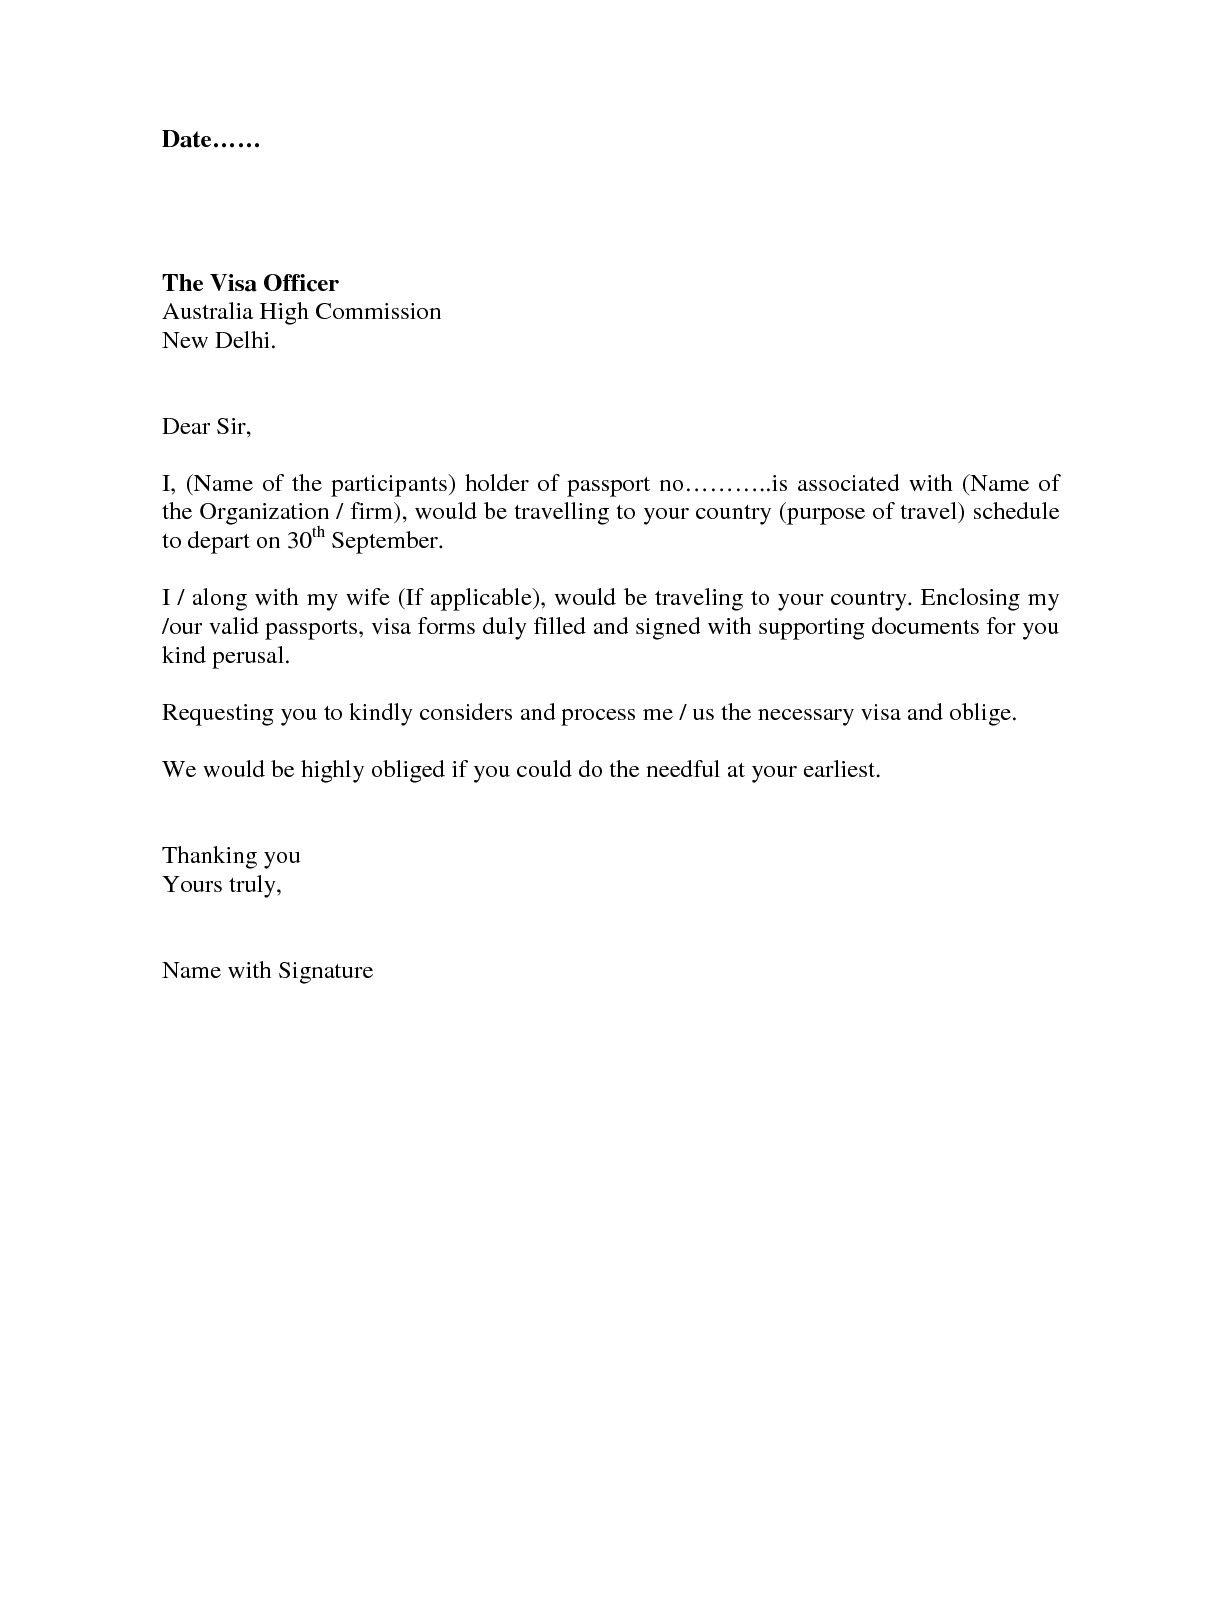 Cover Letter Template Visa Application | Cover Letter Template ...